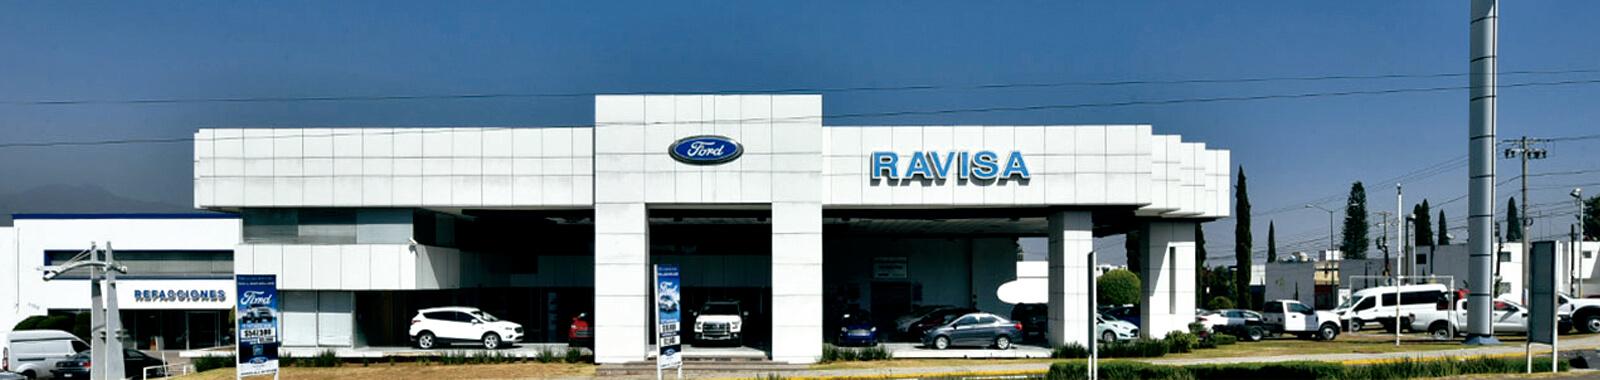 Ford Ravisa Morelia